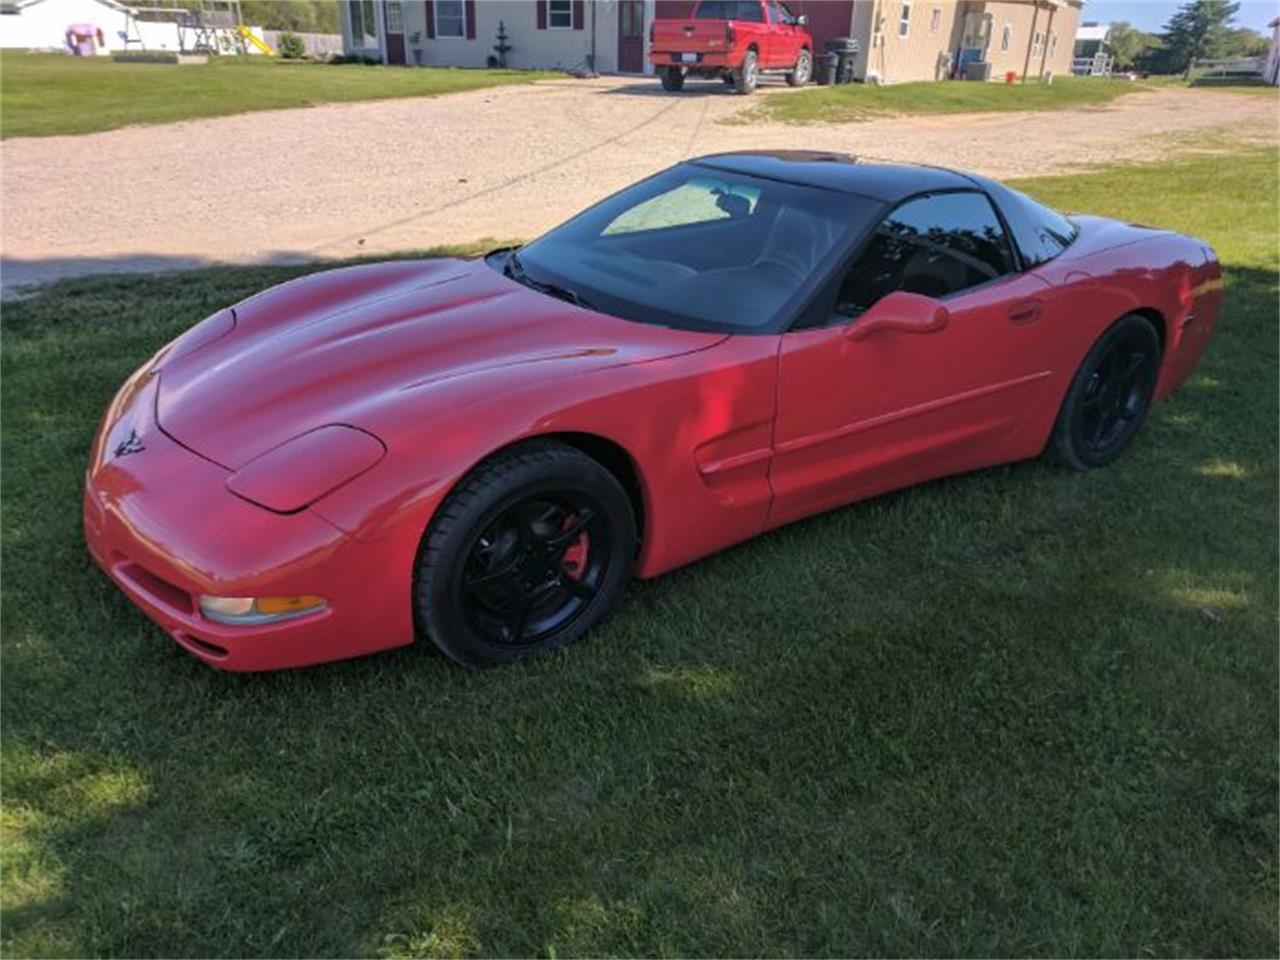 Large Picture of '00 Chevrolet Corvette located in Michigan - $13,900.00 - L7I1